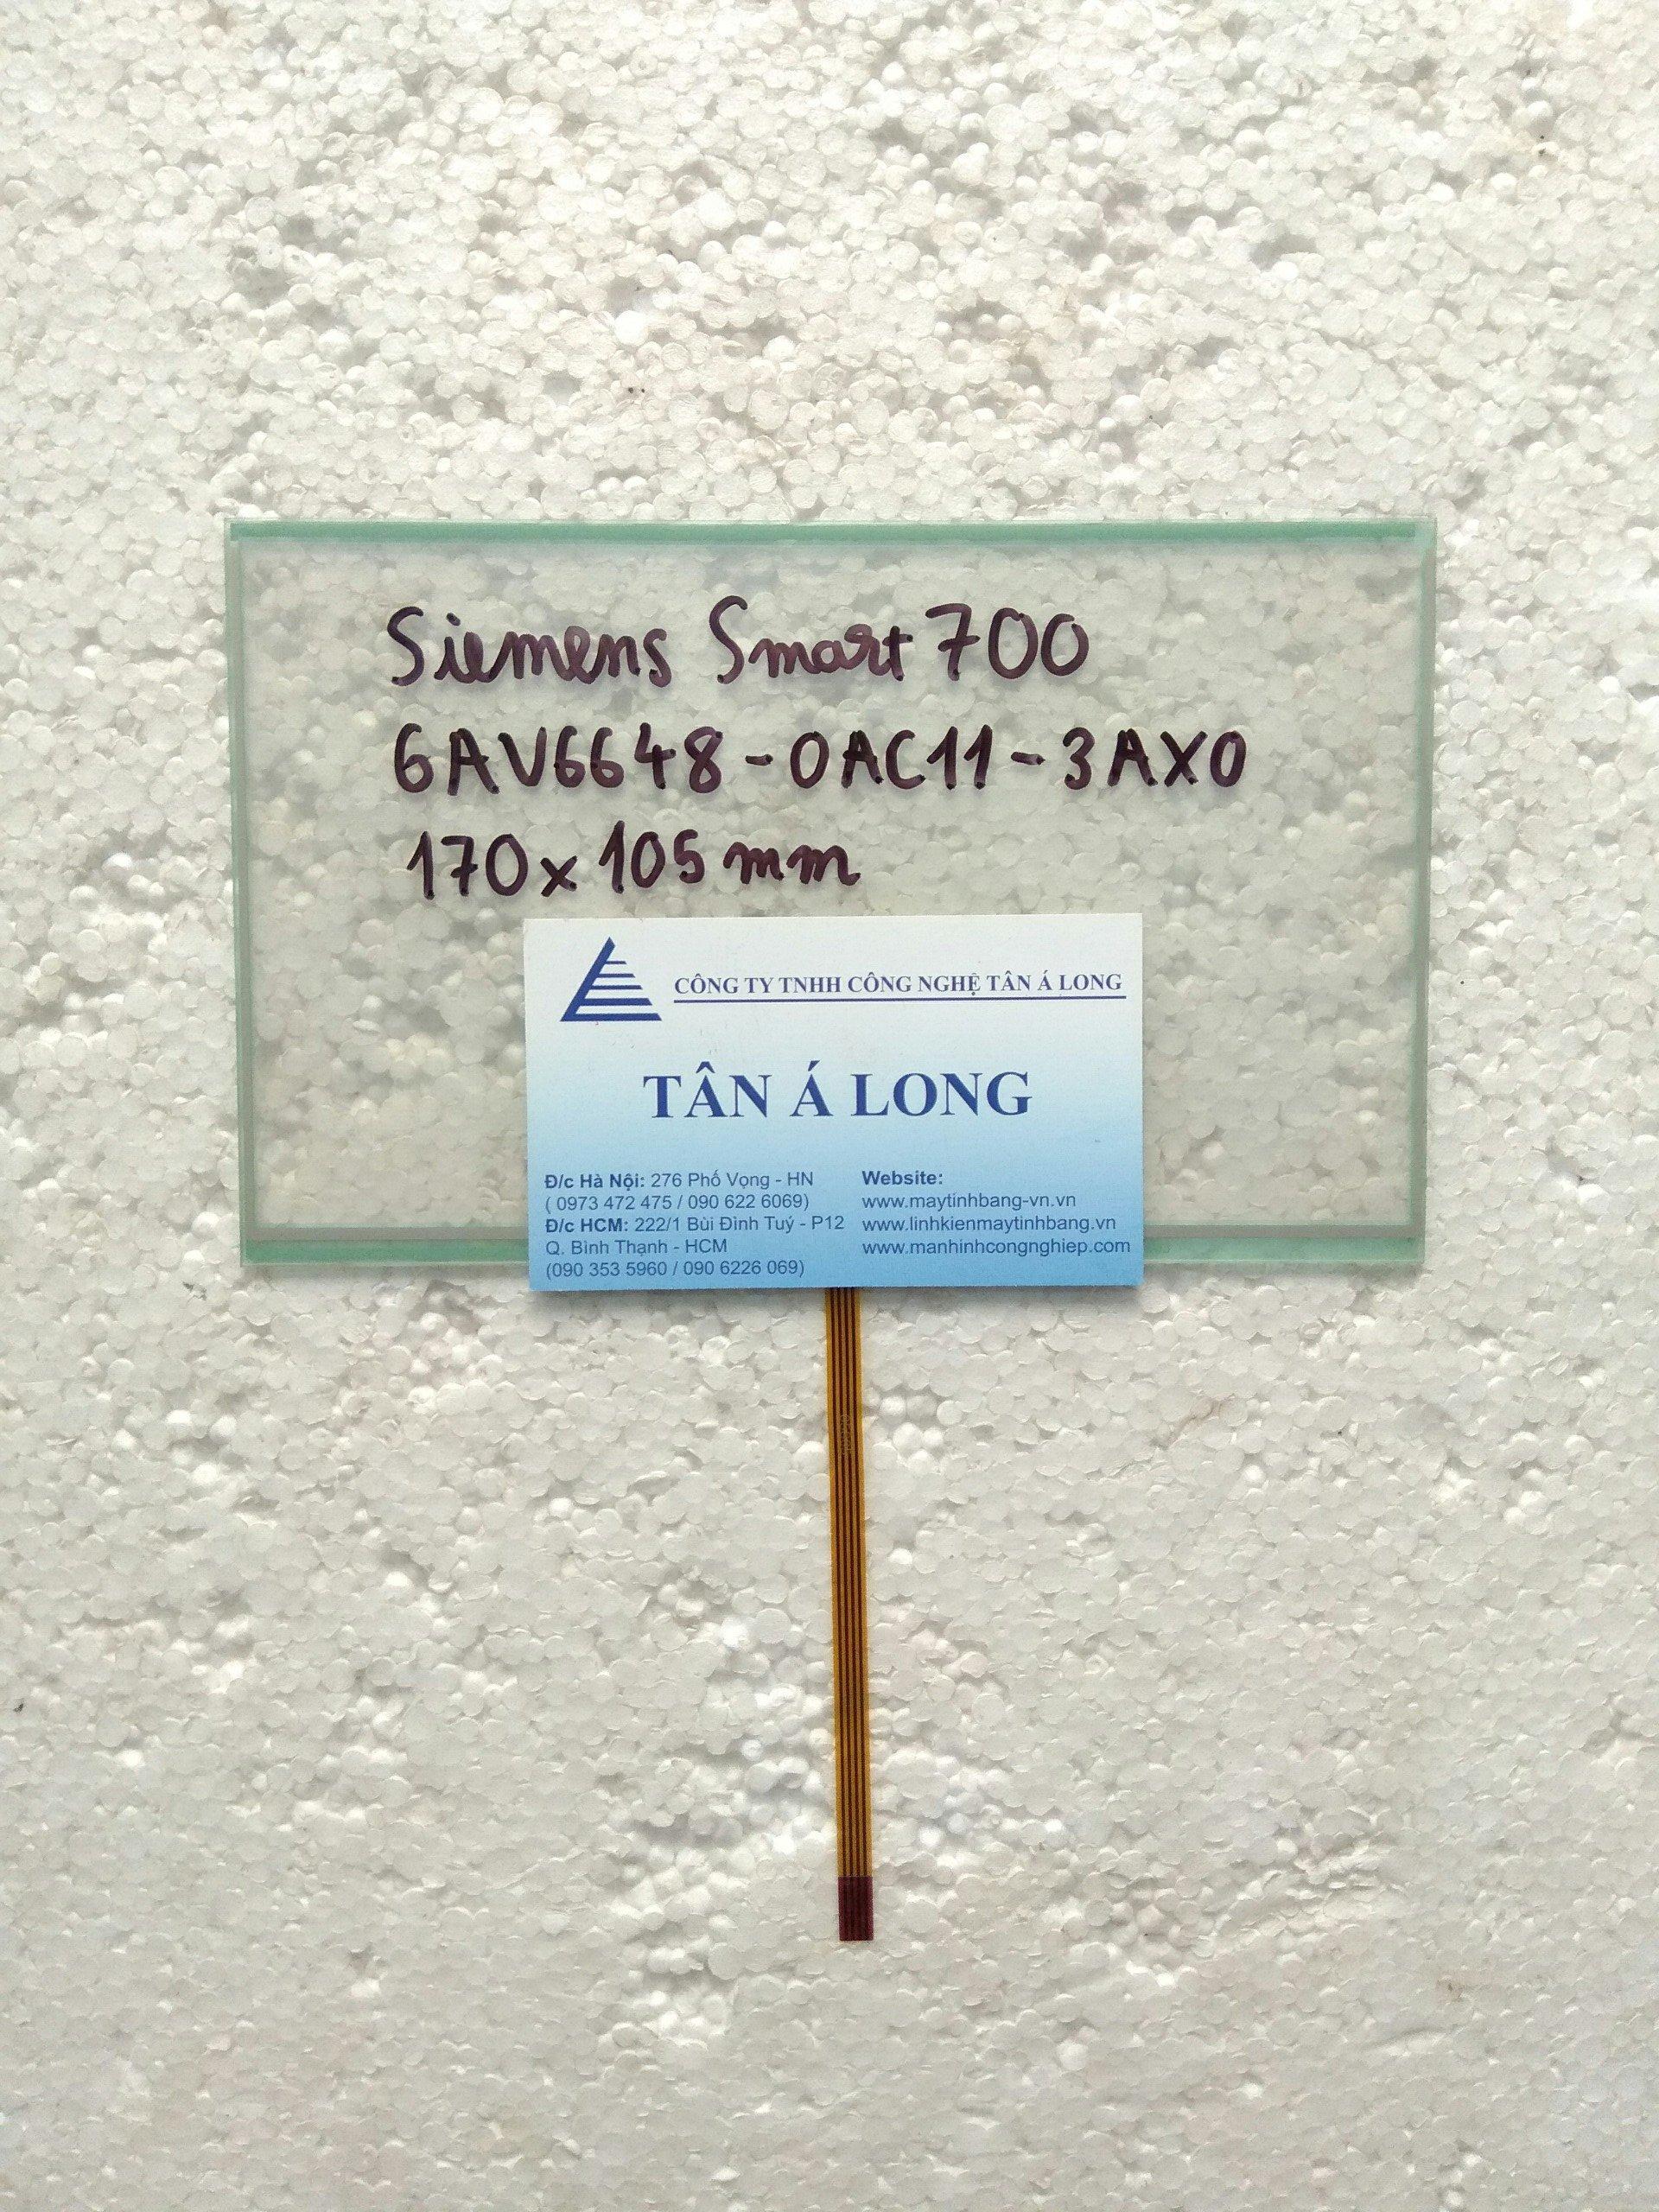 cam ung Siemens smart 700 6av6648-0AC11-3AX0 170x105mm